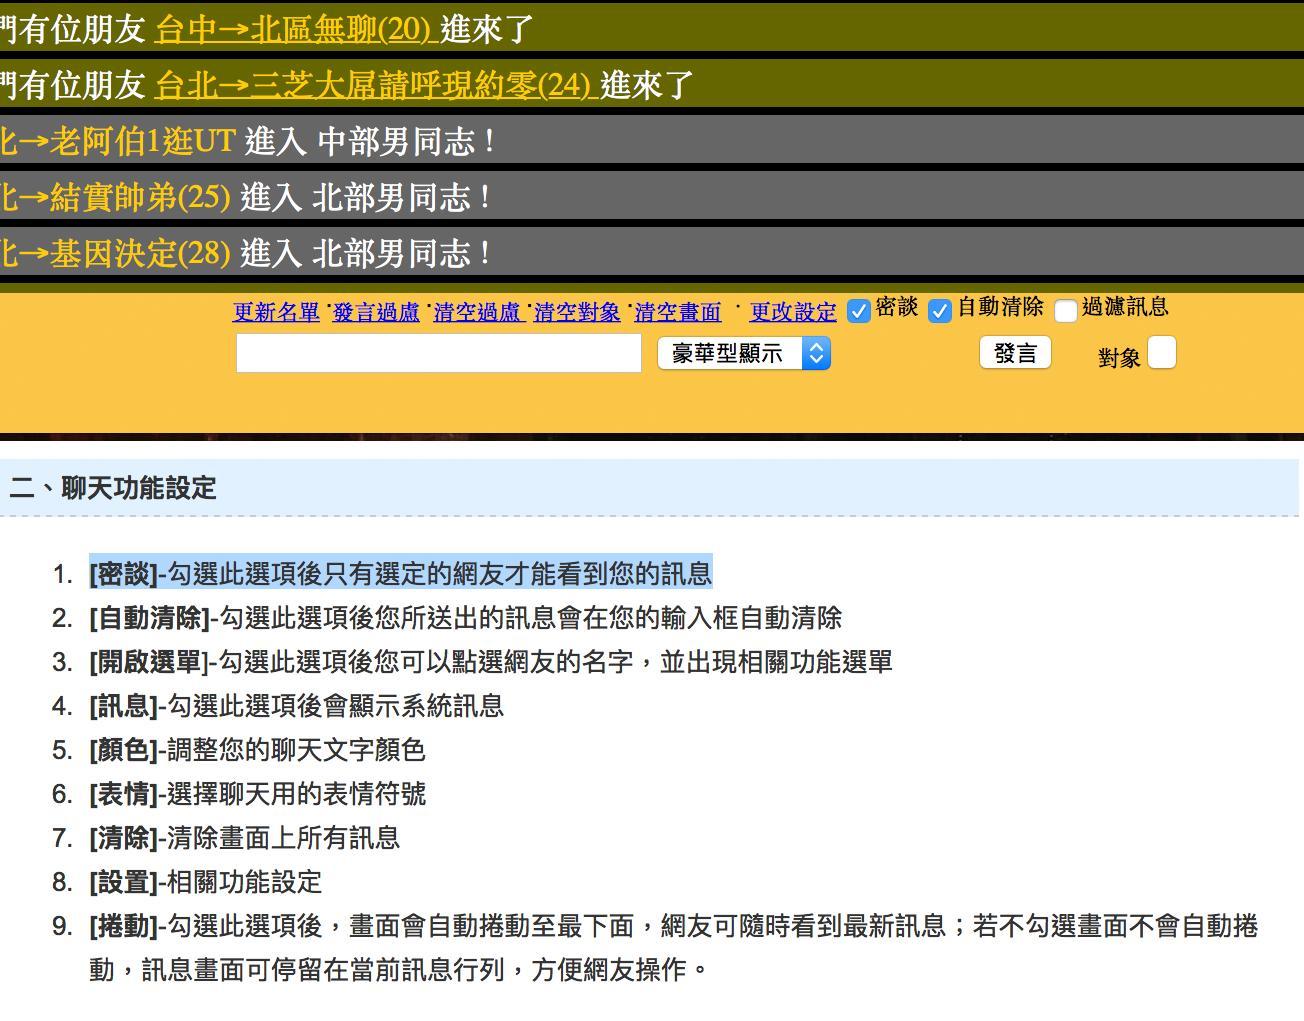 UT聊天室中勾選「密談」功能後,僅選定對象可看到訊息。(翻攝網路)